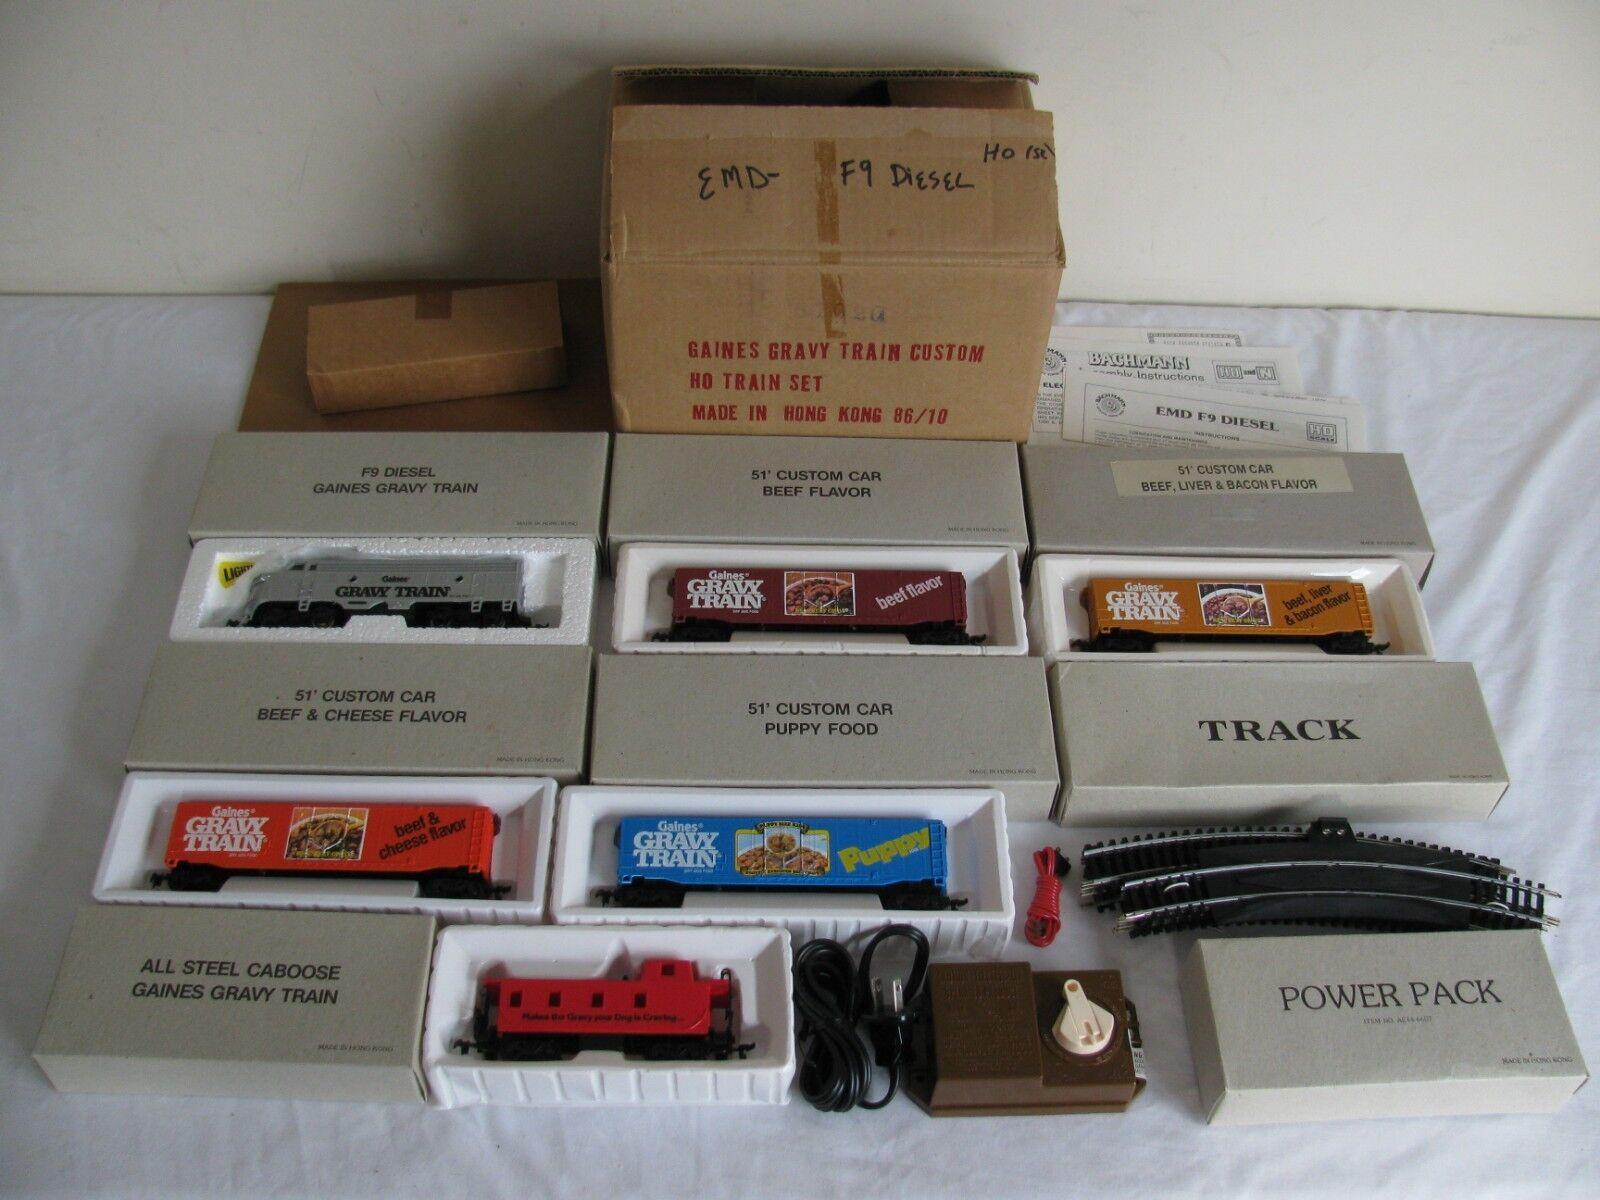 Vintage Bachmann HO Scale Gaines Gravy Train Promotion Set NIB